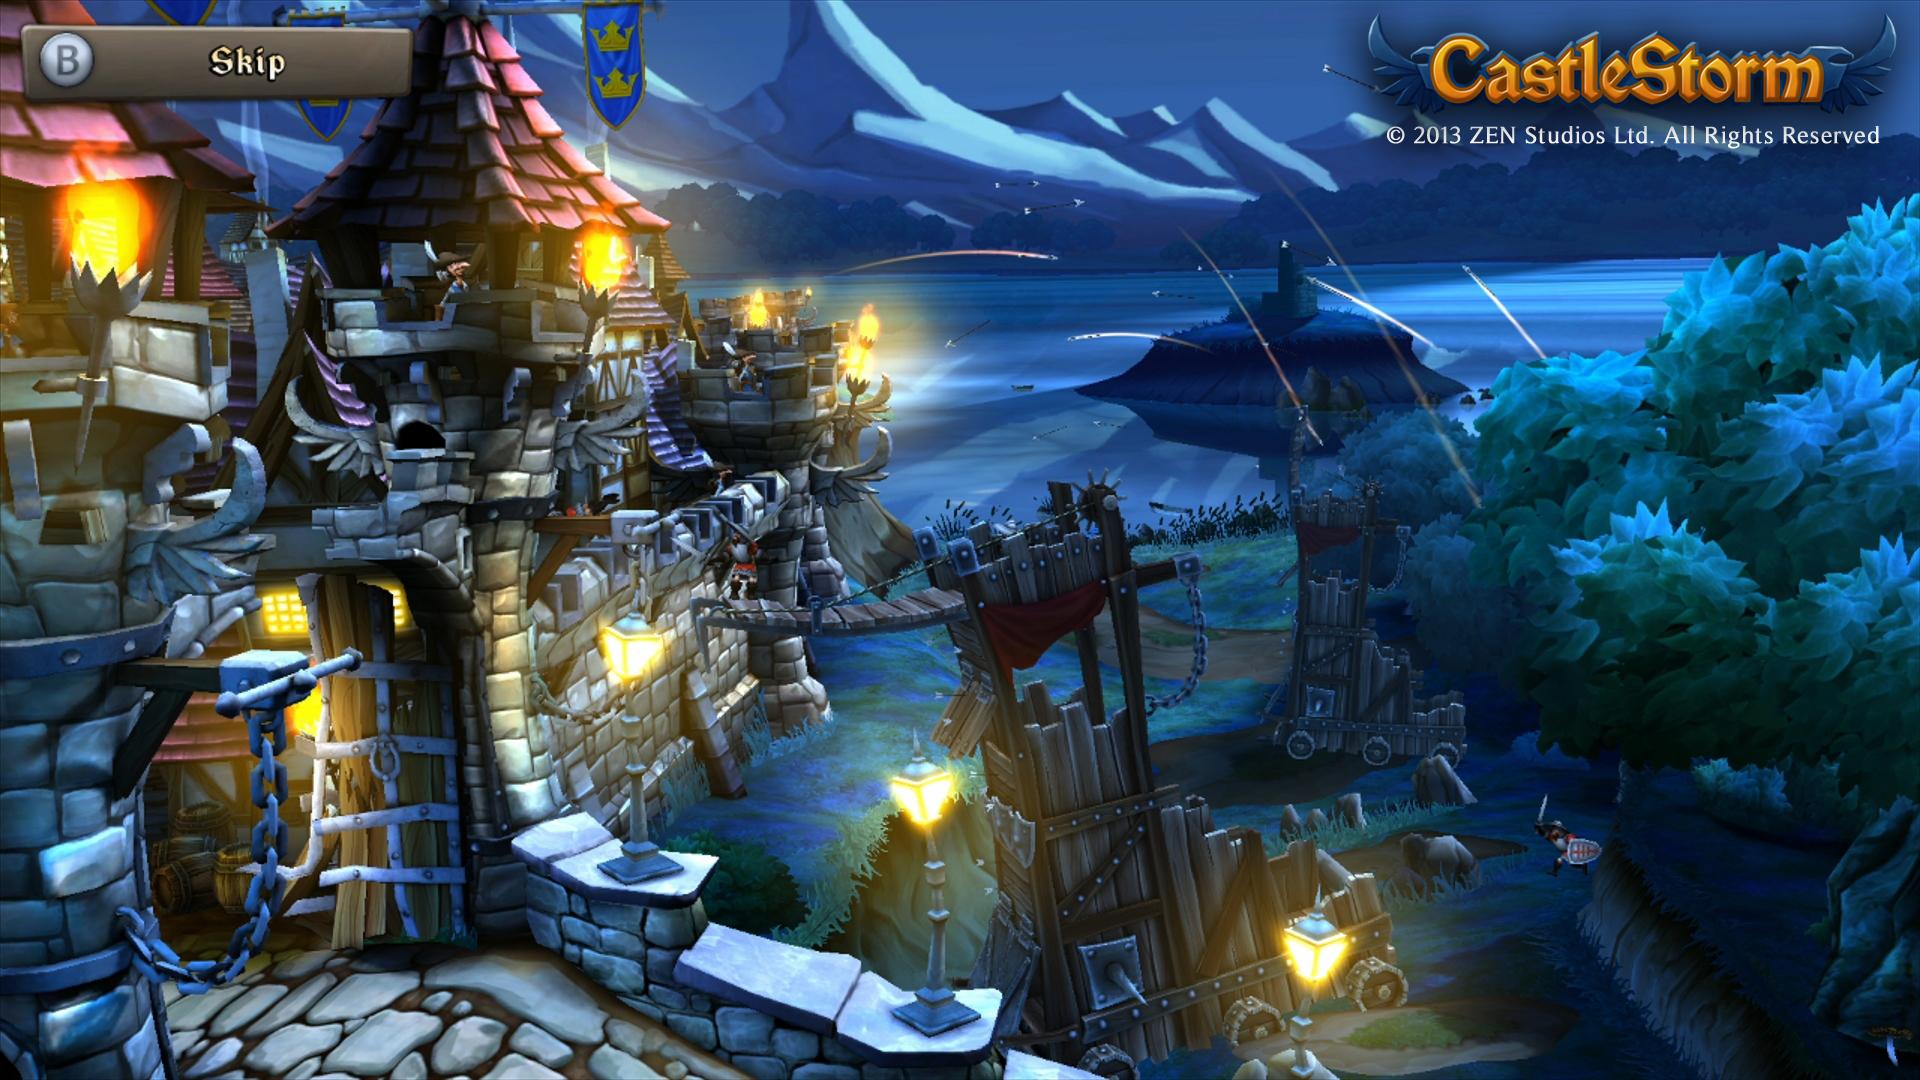 PR: CastleStorm Releasing on Wii U eShop December 26